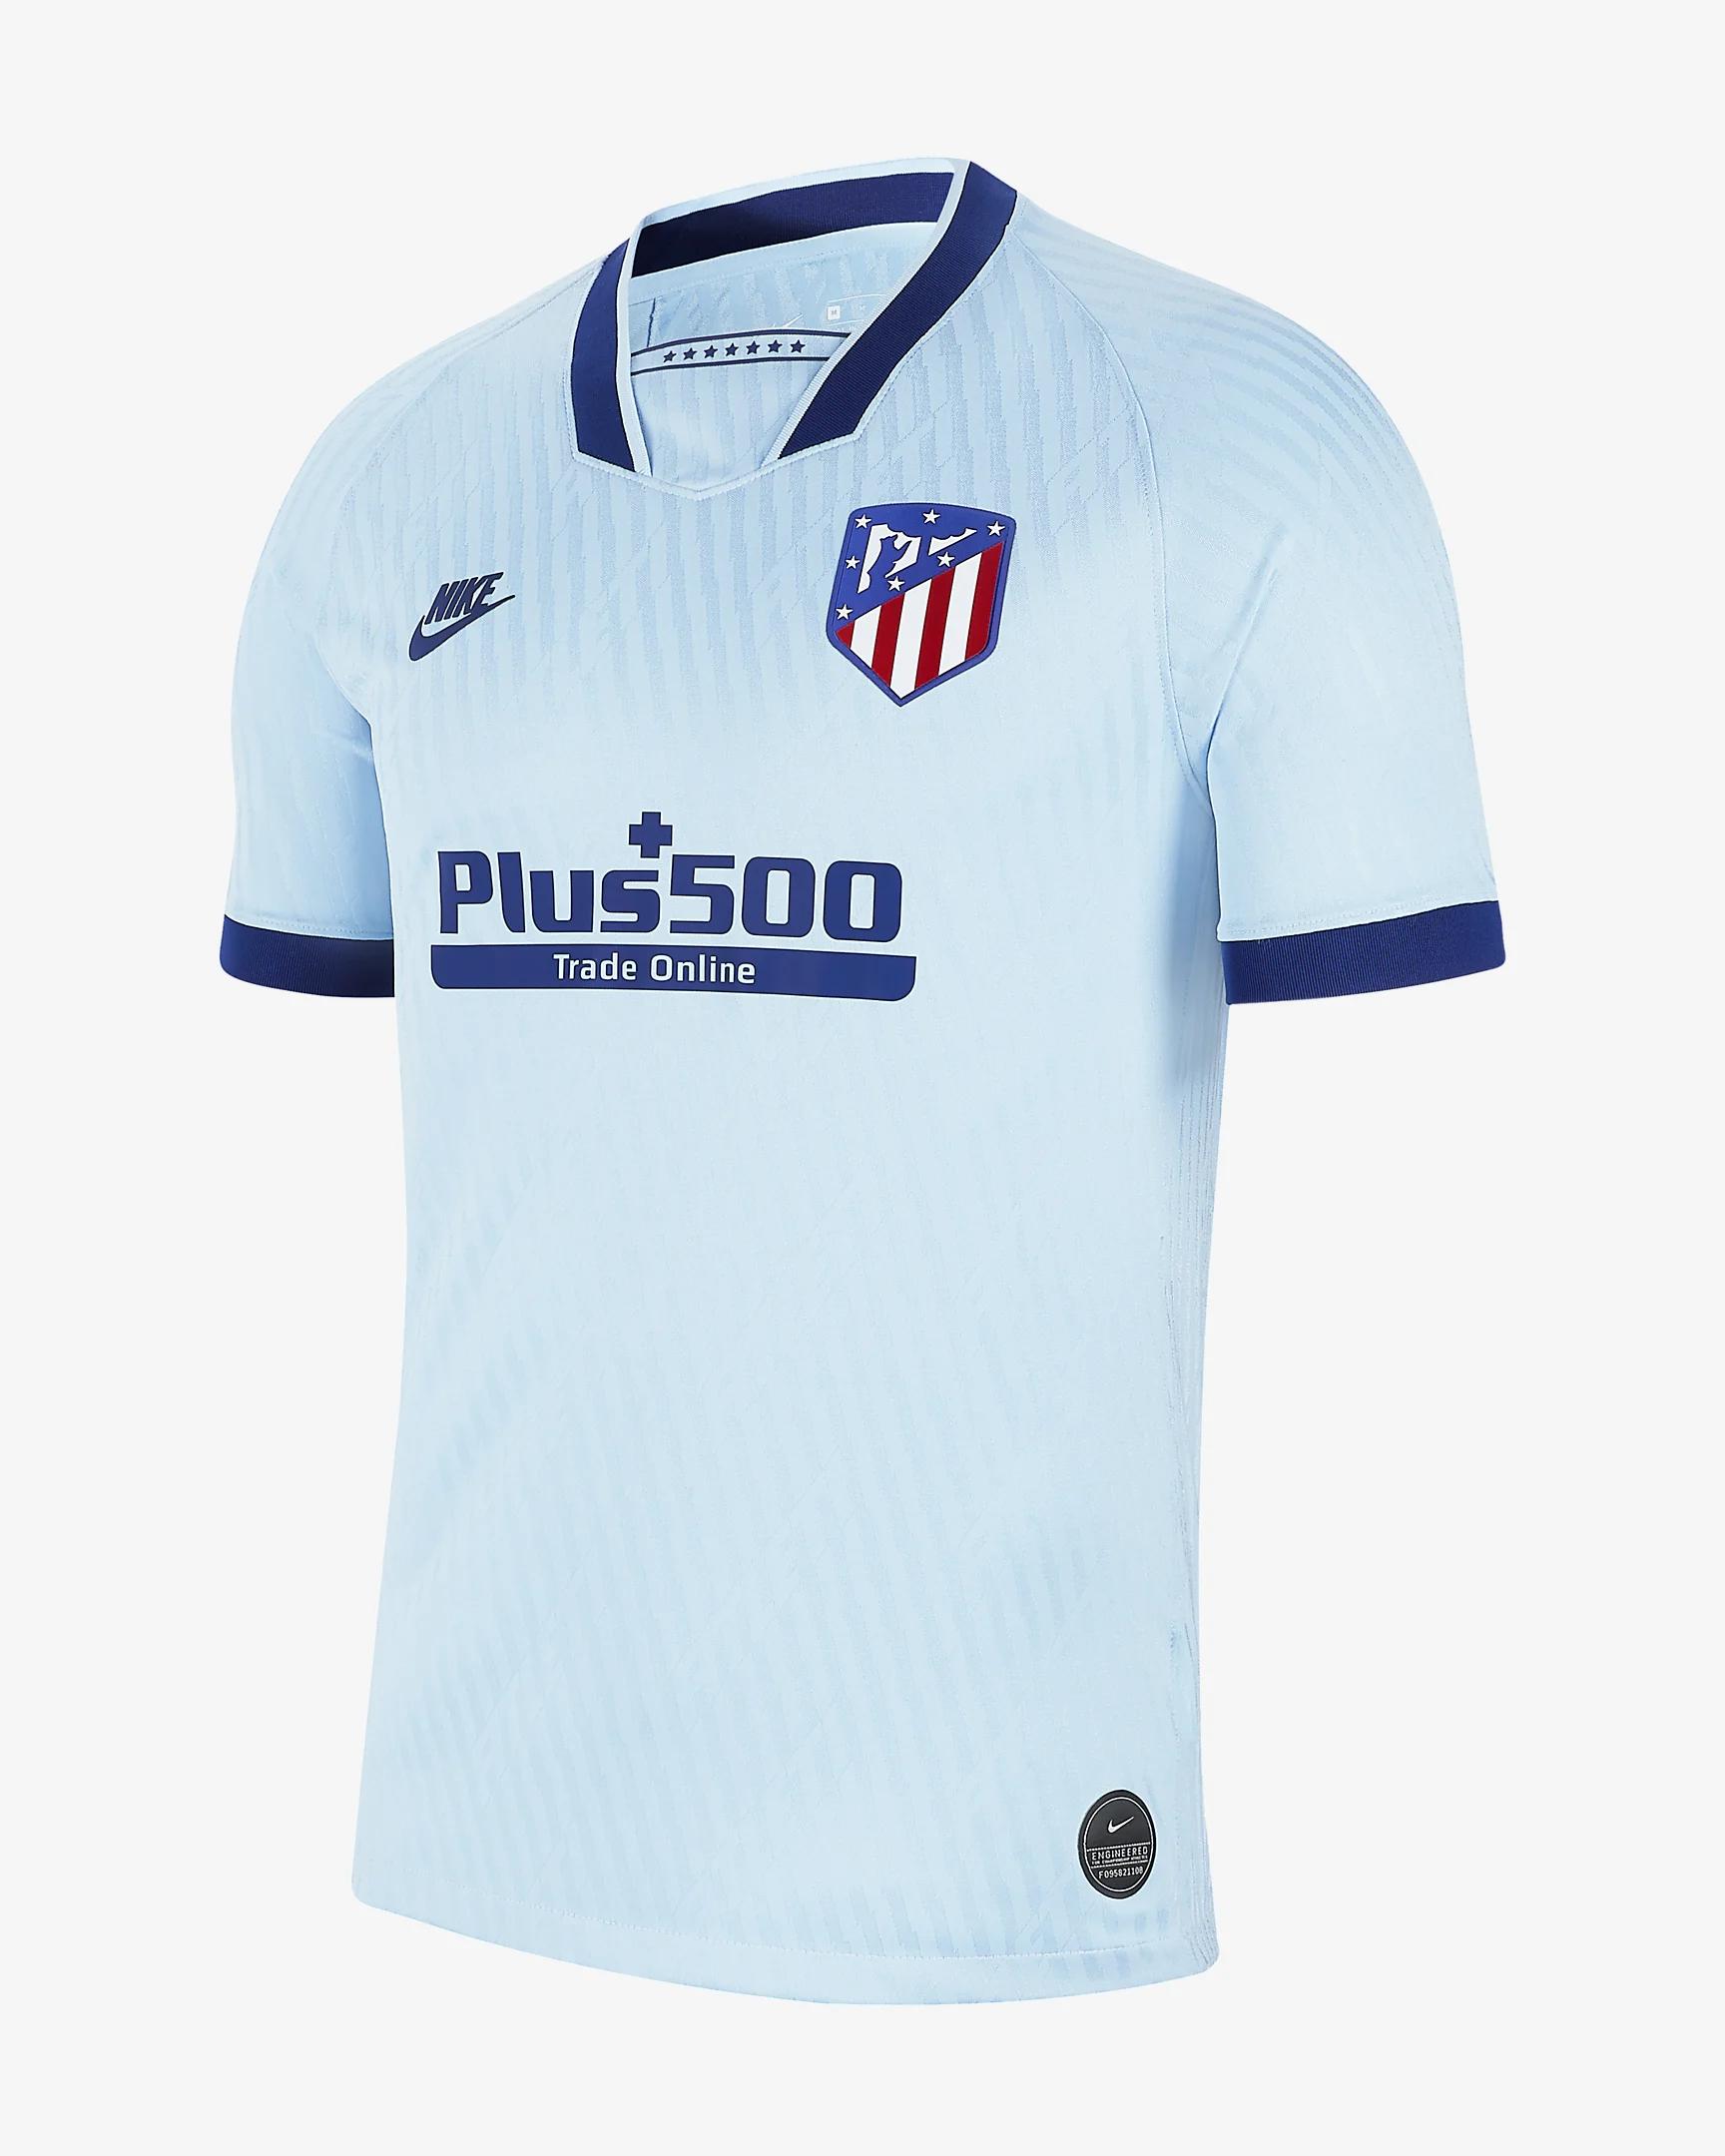 Tfc Football Nike Atletico Madrid Third 19 20 Jersey